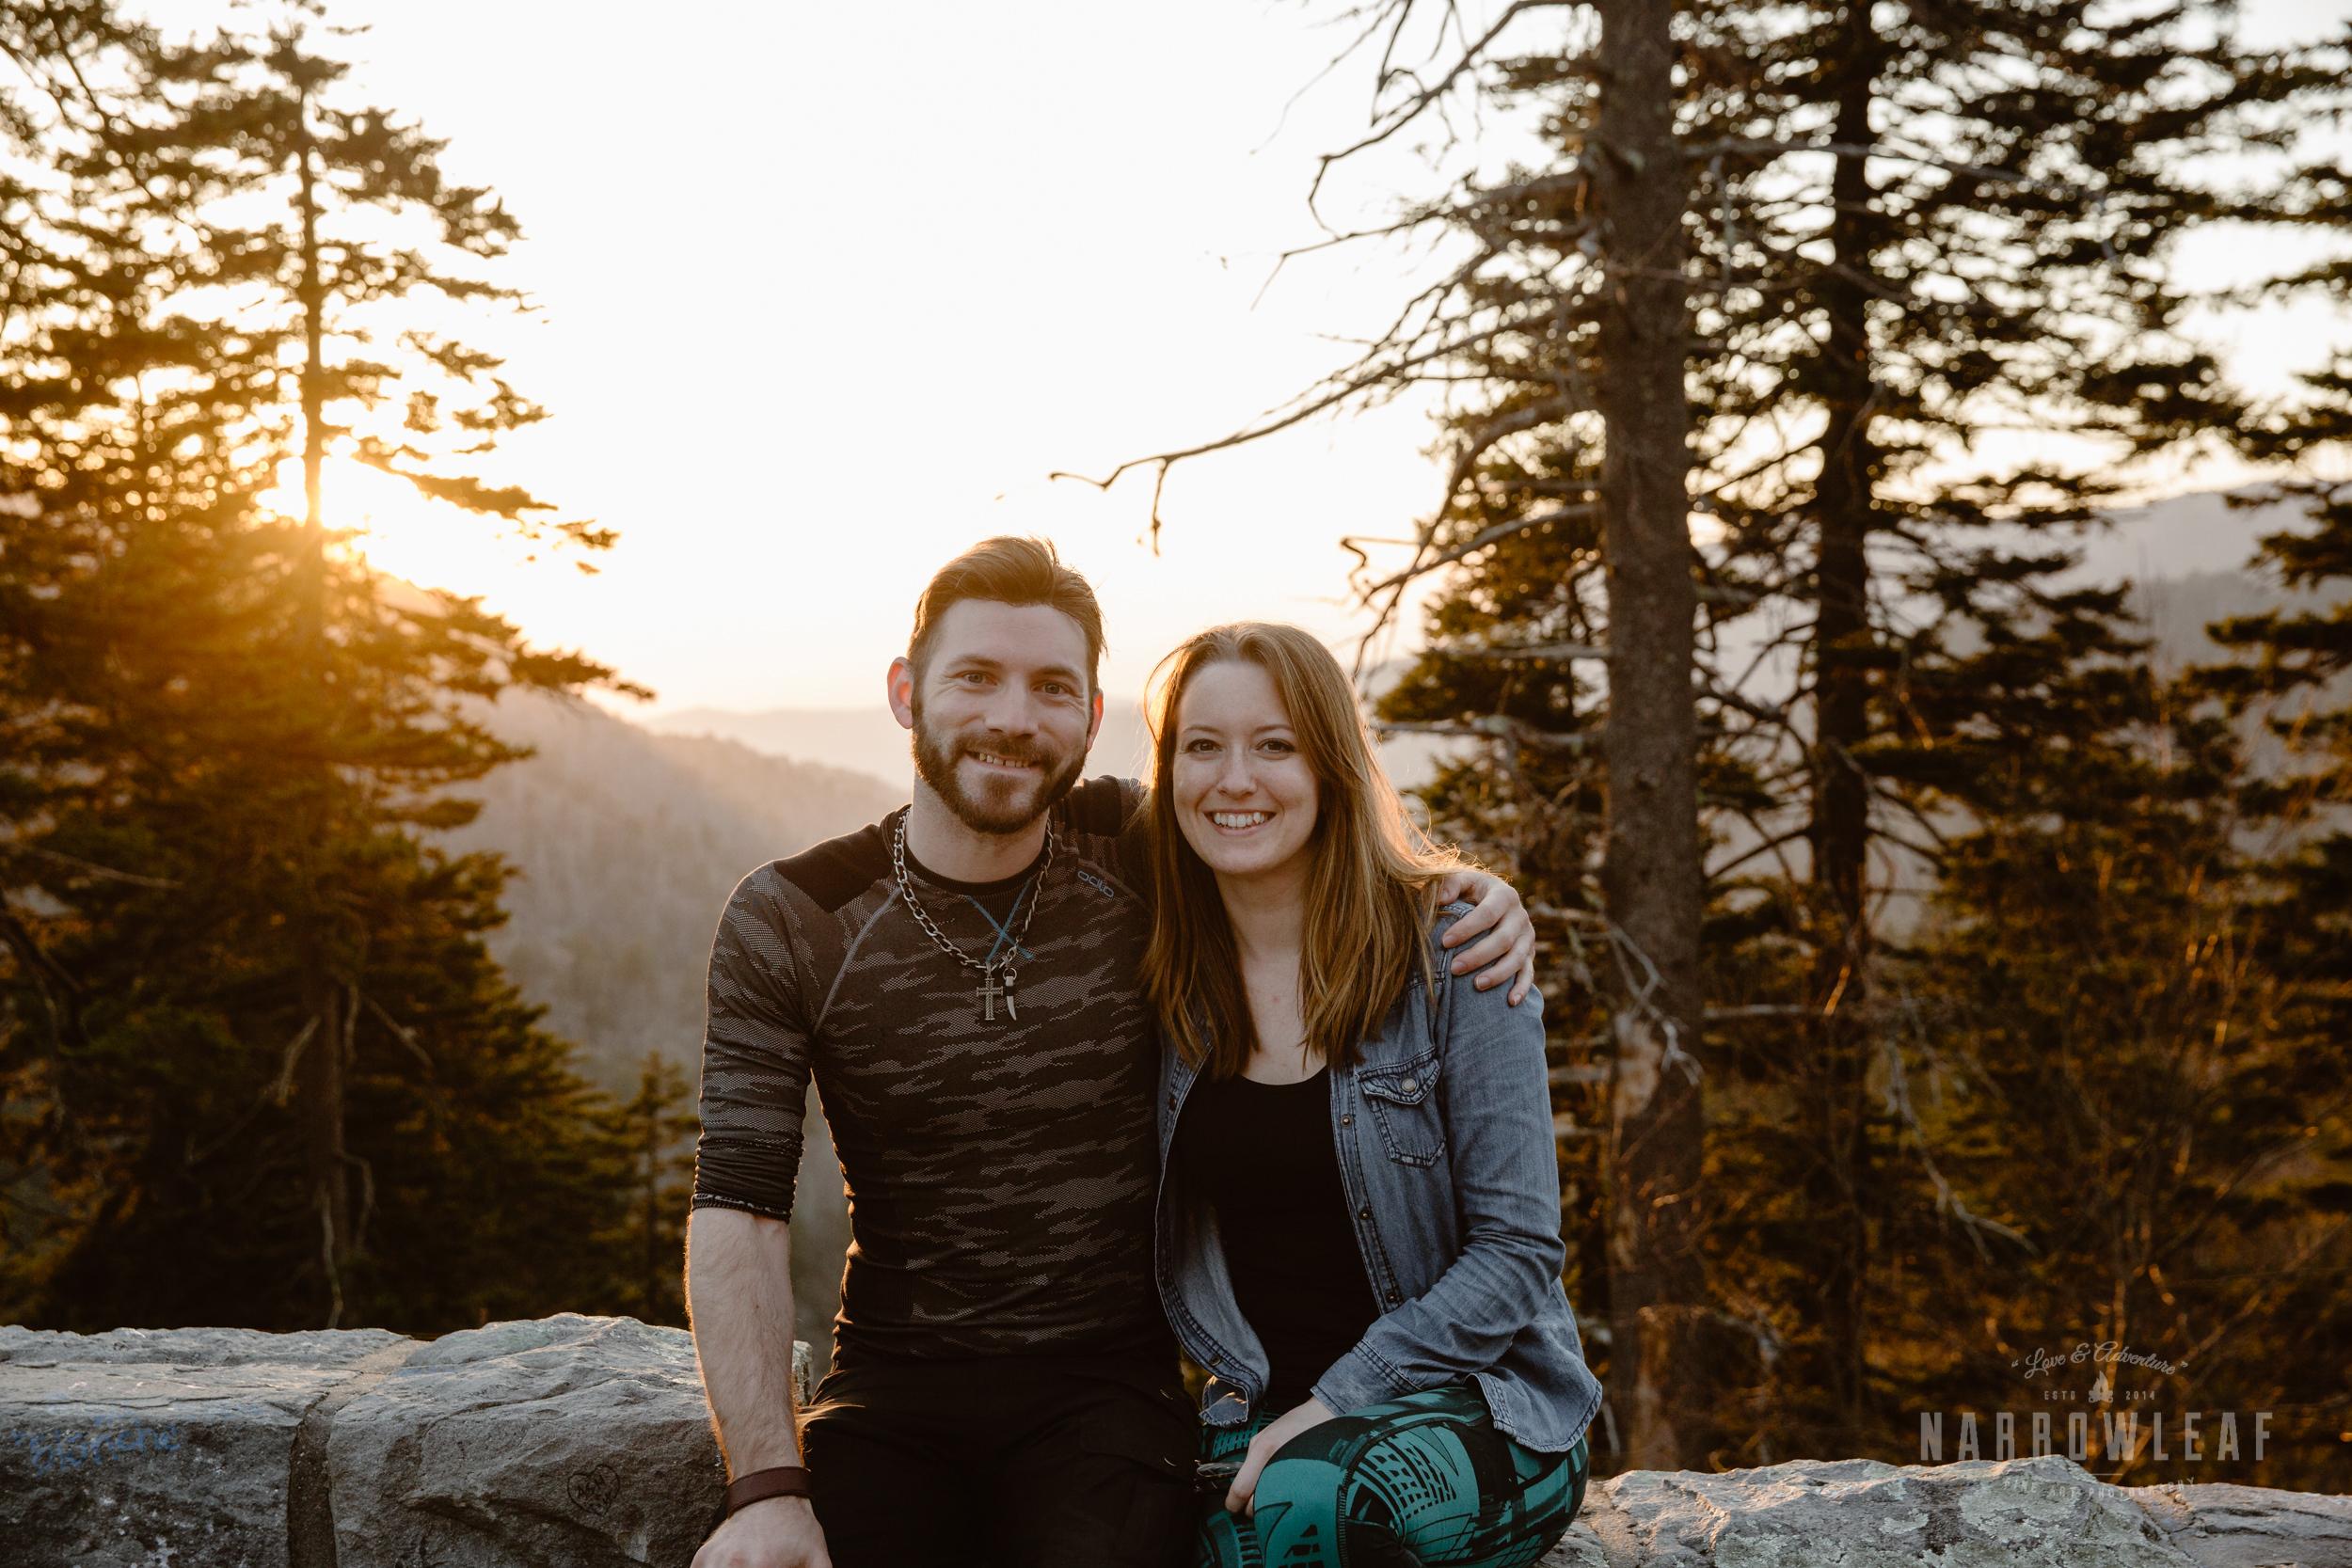 Blue-Ridge-Parkway-North-Carolina-elopement-photographer-Narrowleaf_Love_and_Adventure_Photography-0105.jpg